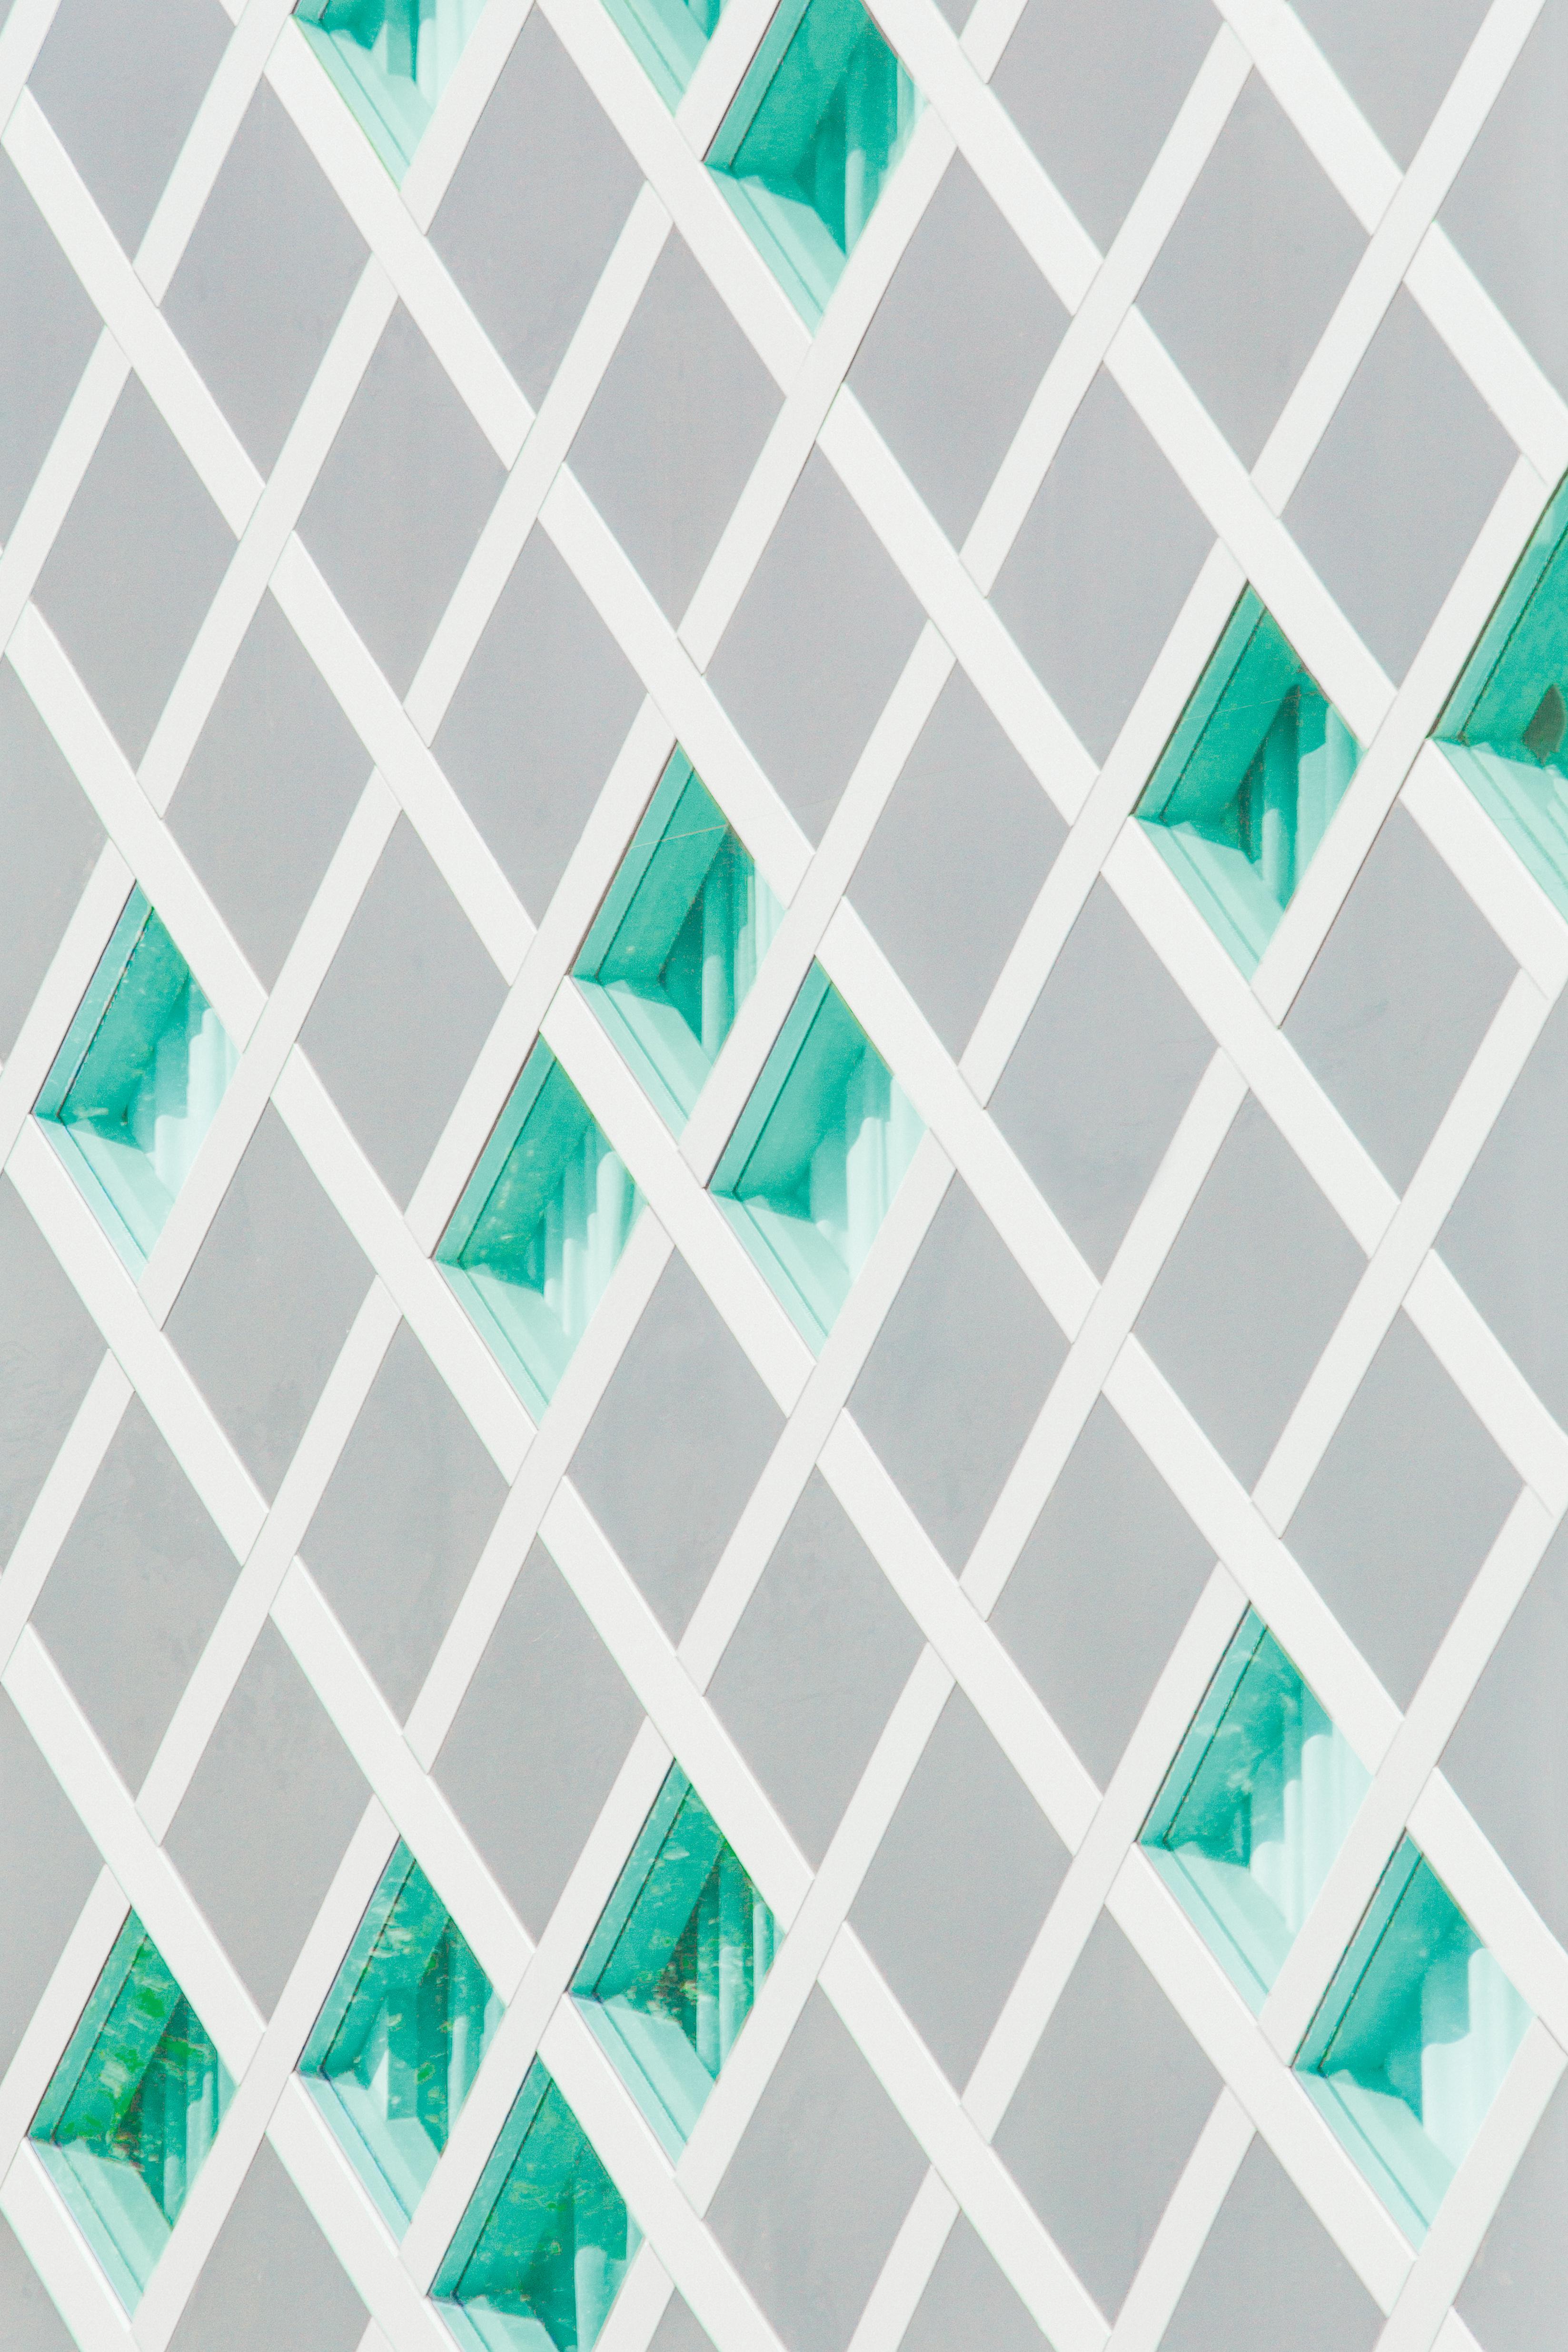 gambar : tekstur, pola, garis, hijau, geometris, kotak, ubin, biru